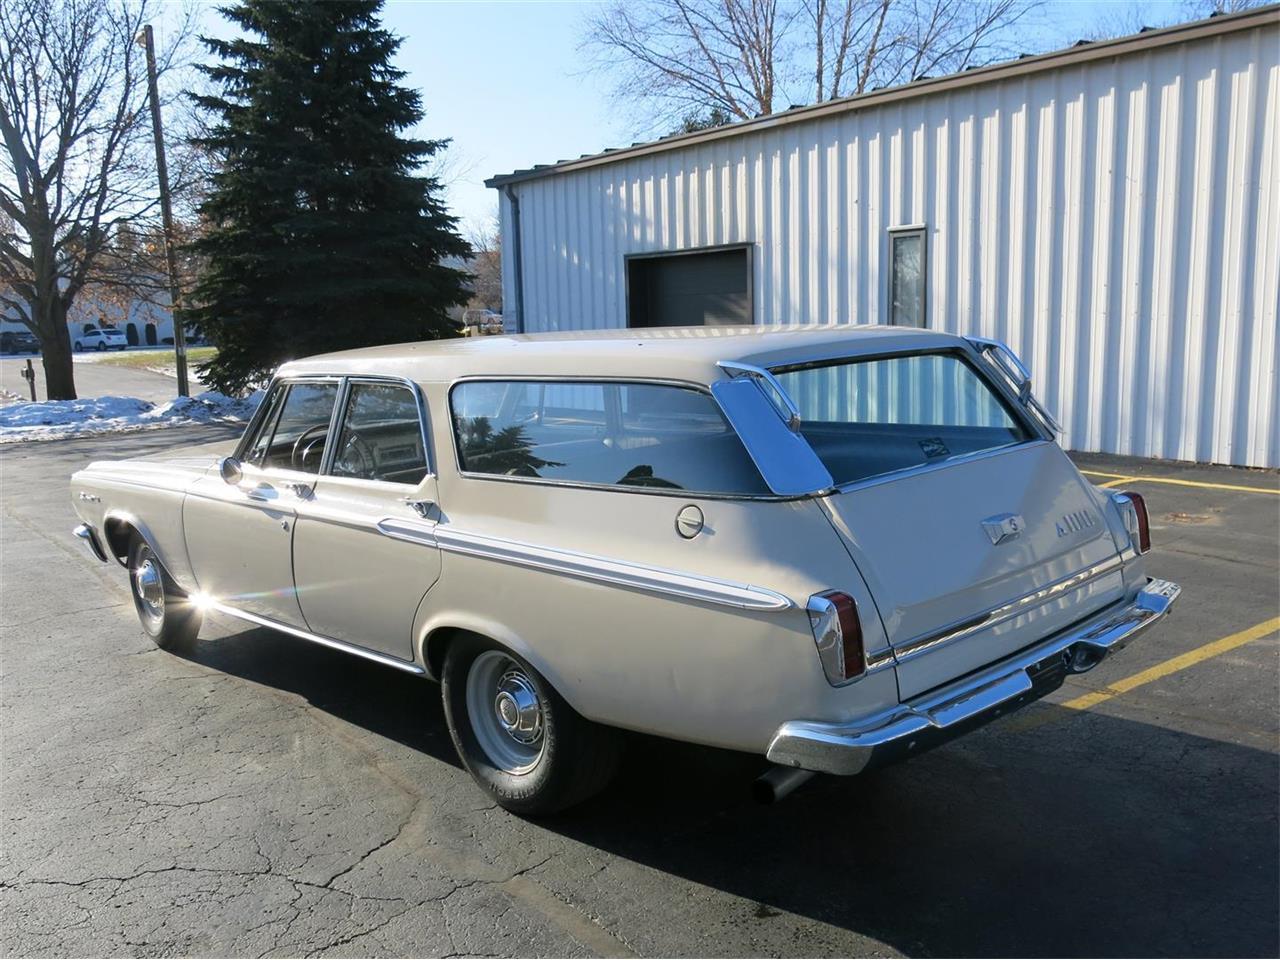 1965 Dodge Coronet 440 For Sale Classiccars Com Cc 1307366